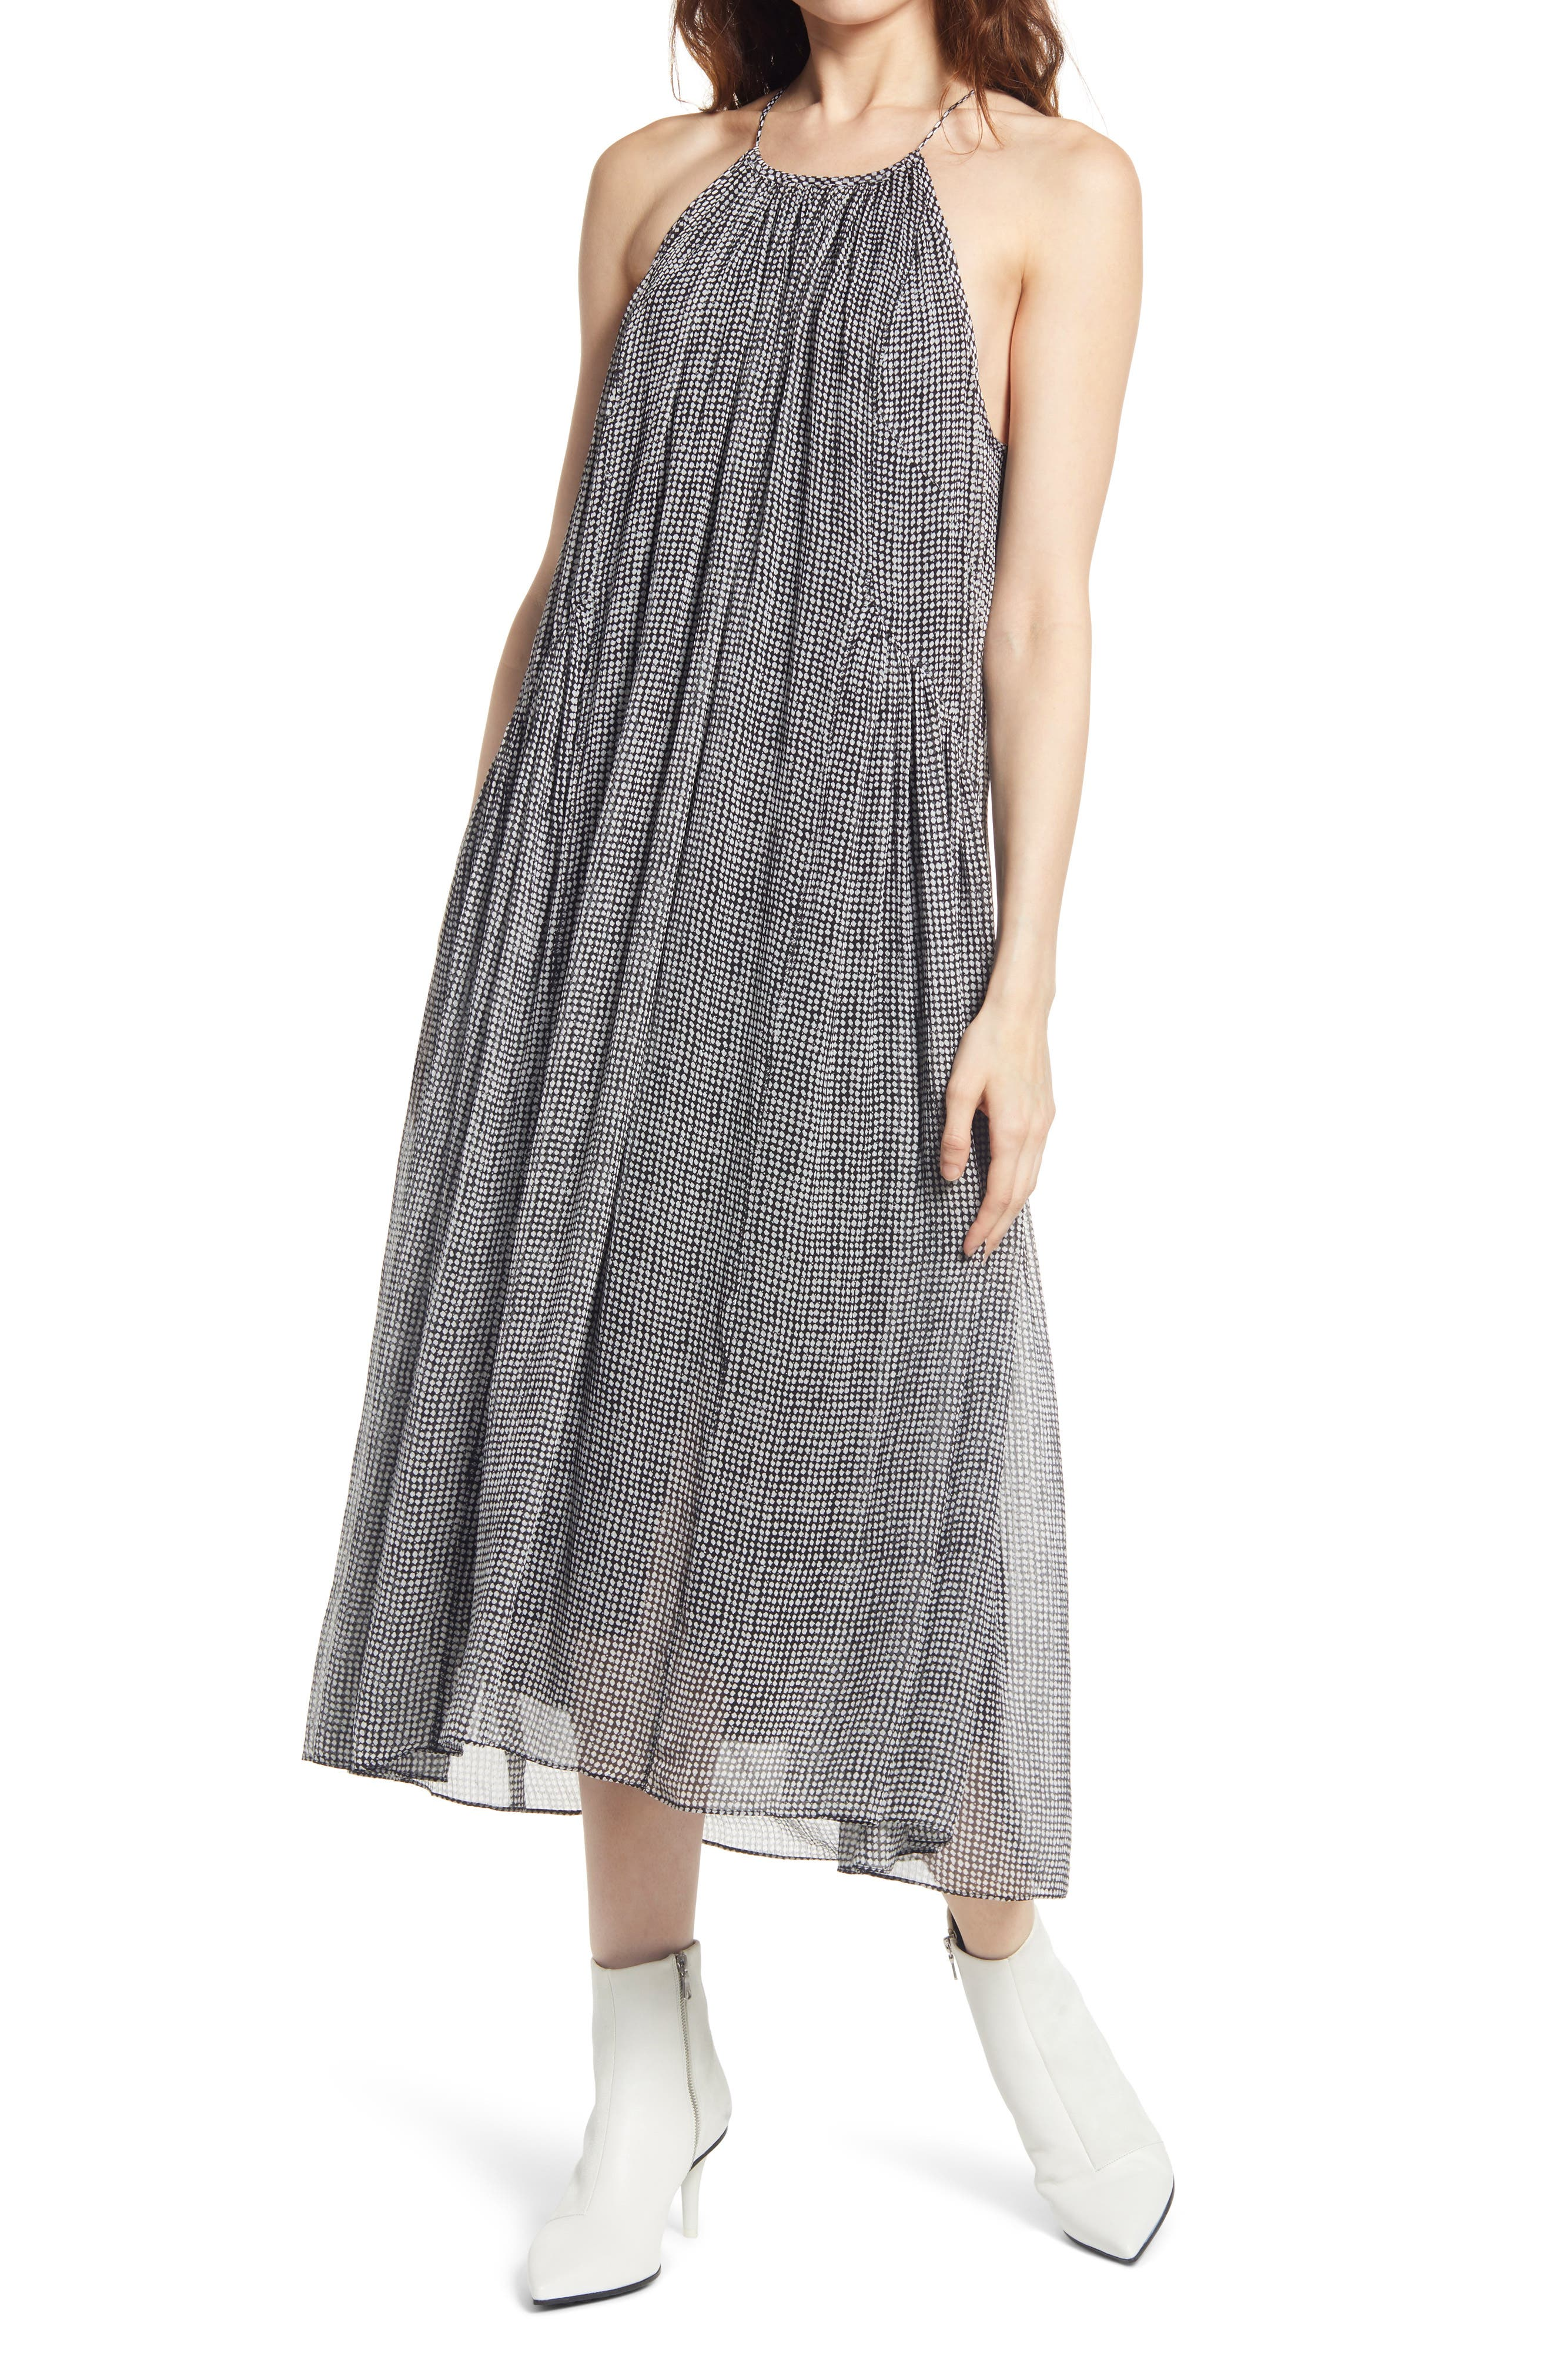 Rag & bone Print Silk Blend Dress | Nordstrom